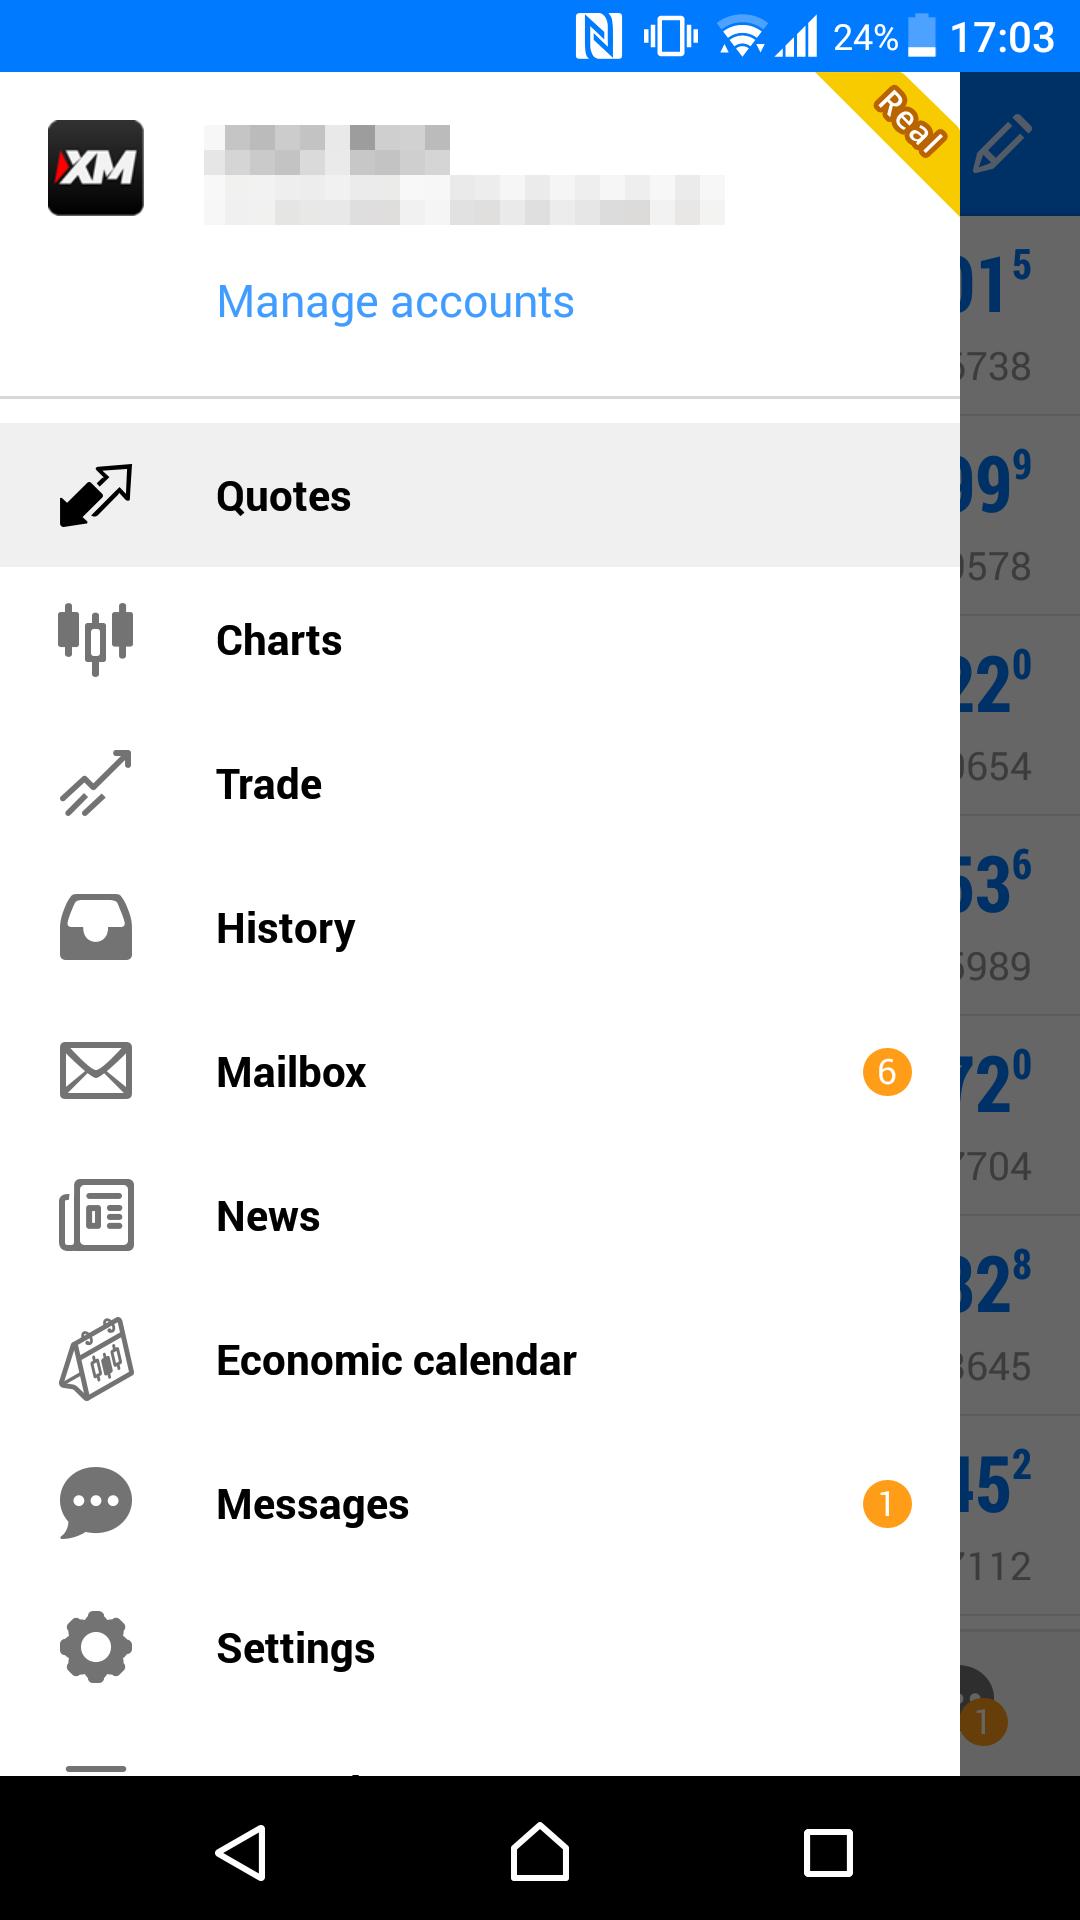 XM review - Mobile trading platform